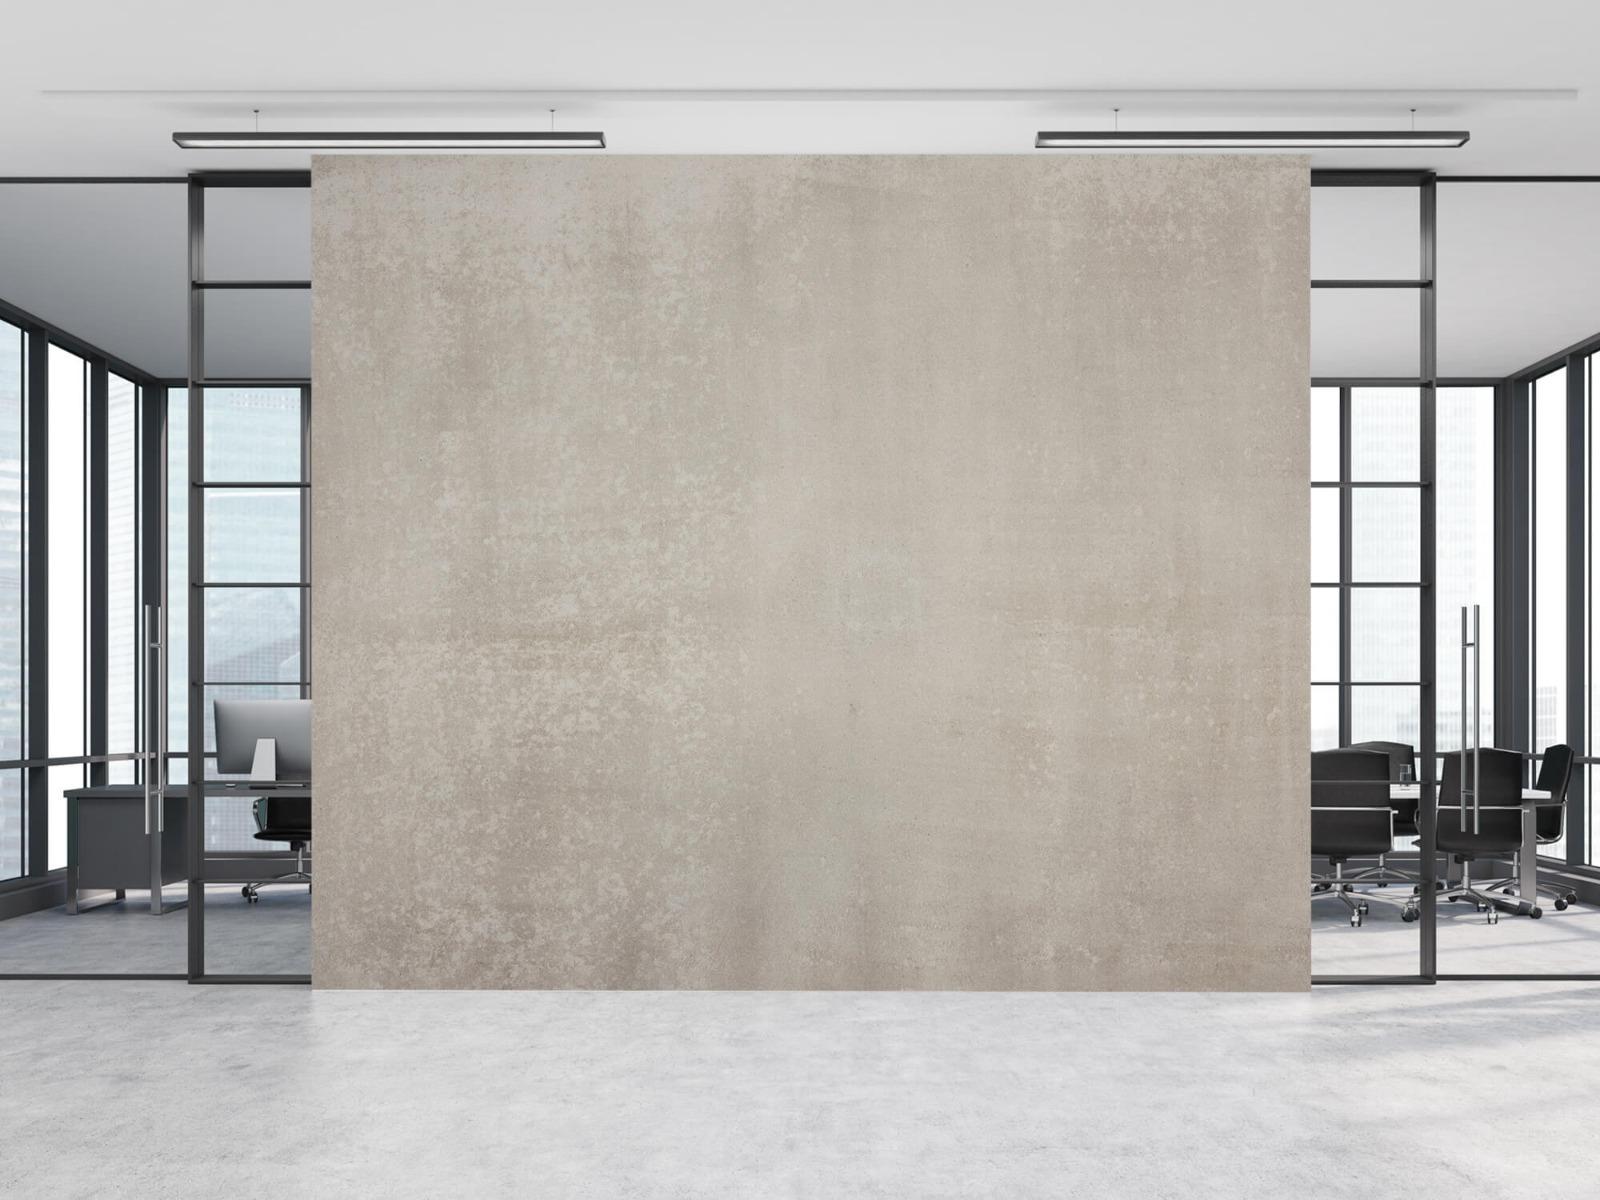 Betonlook behang - Taupe beton - Wallexclusive - Woonkamer 10